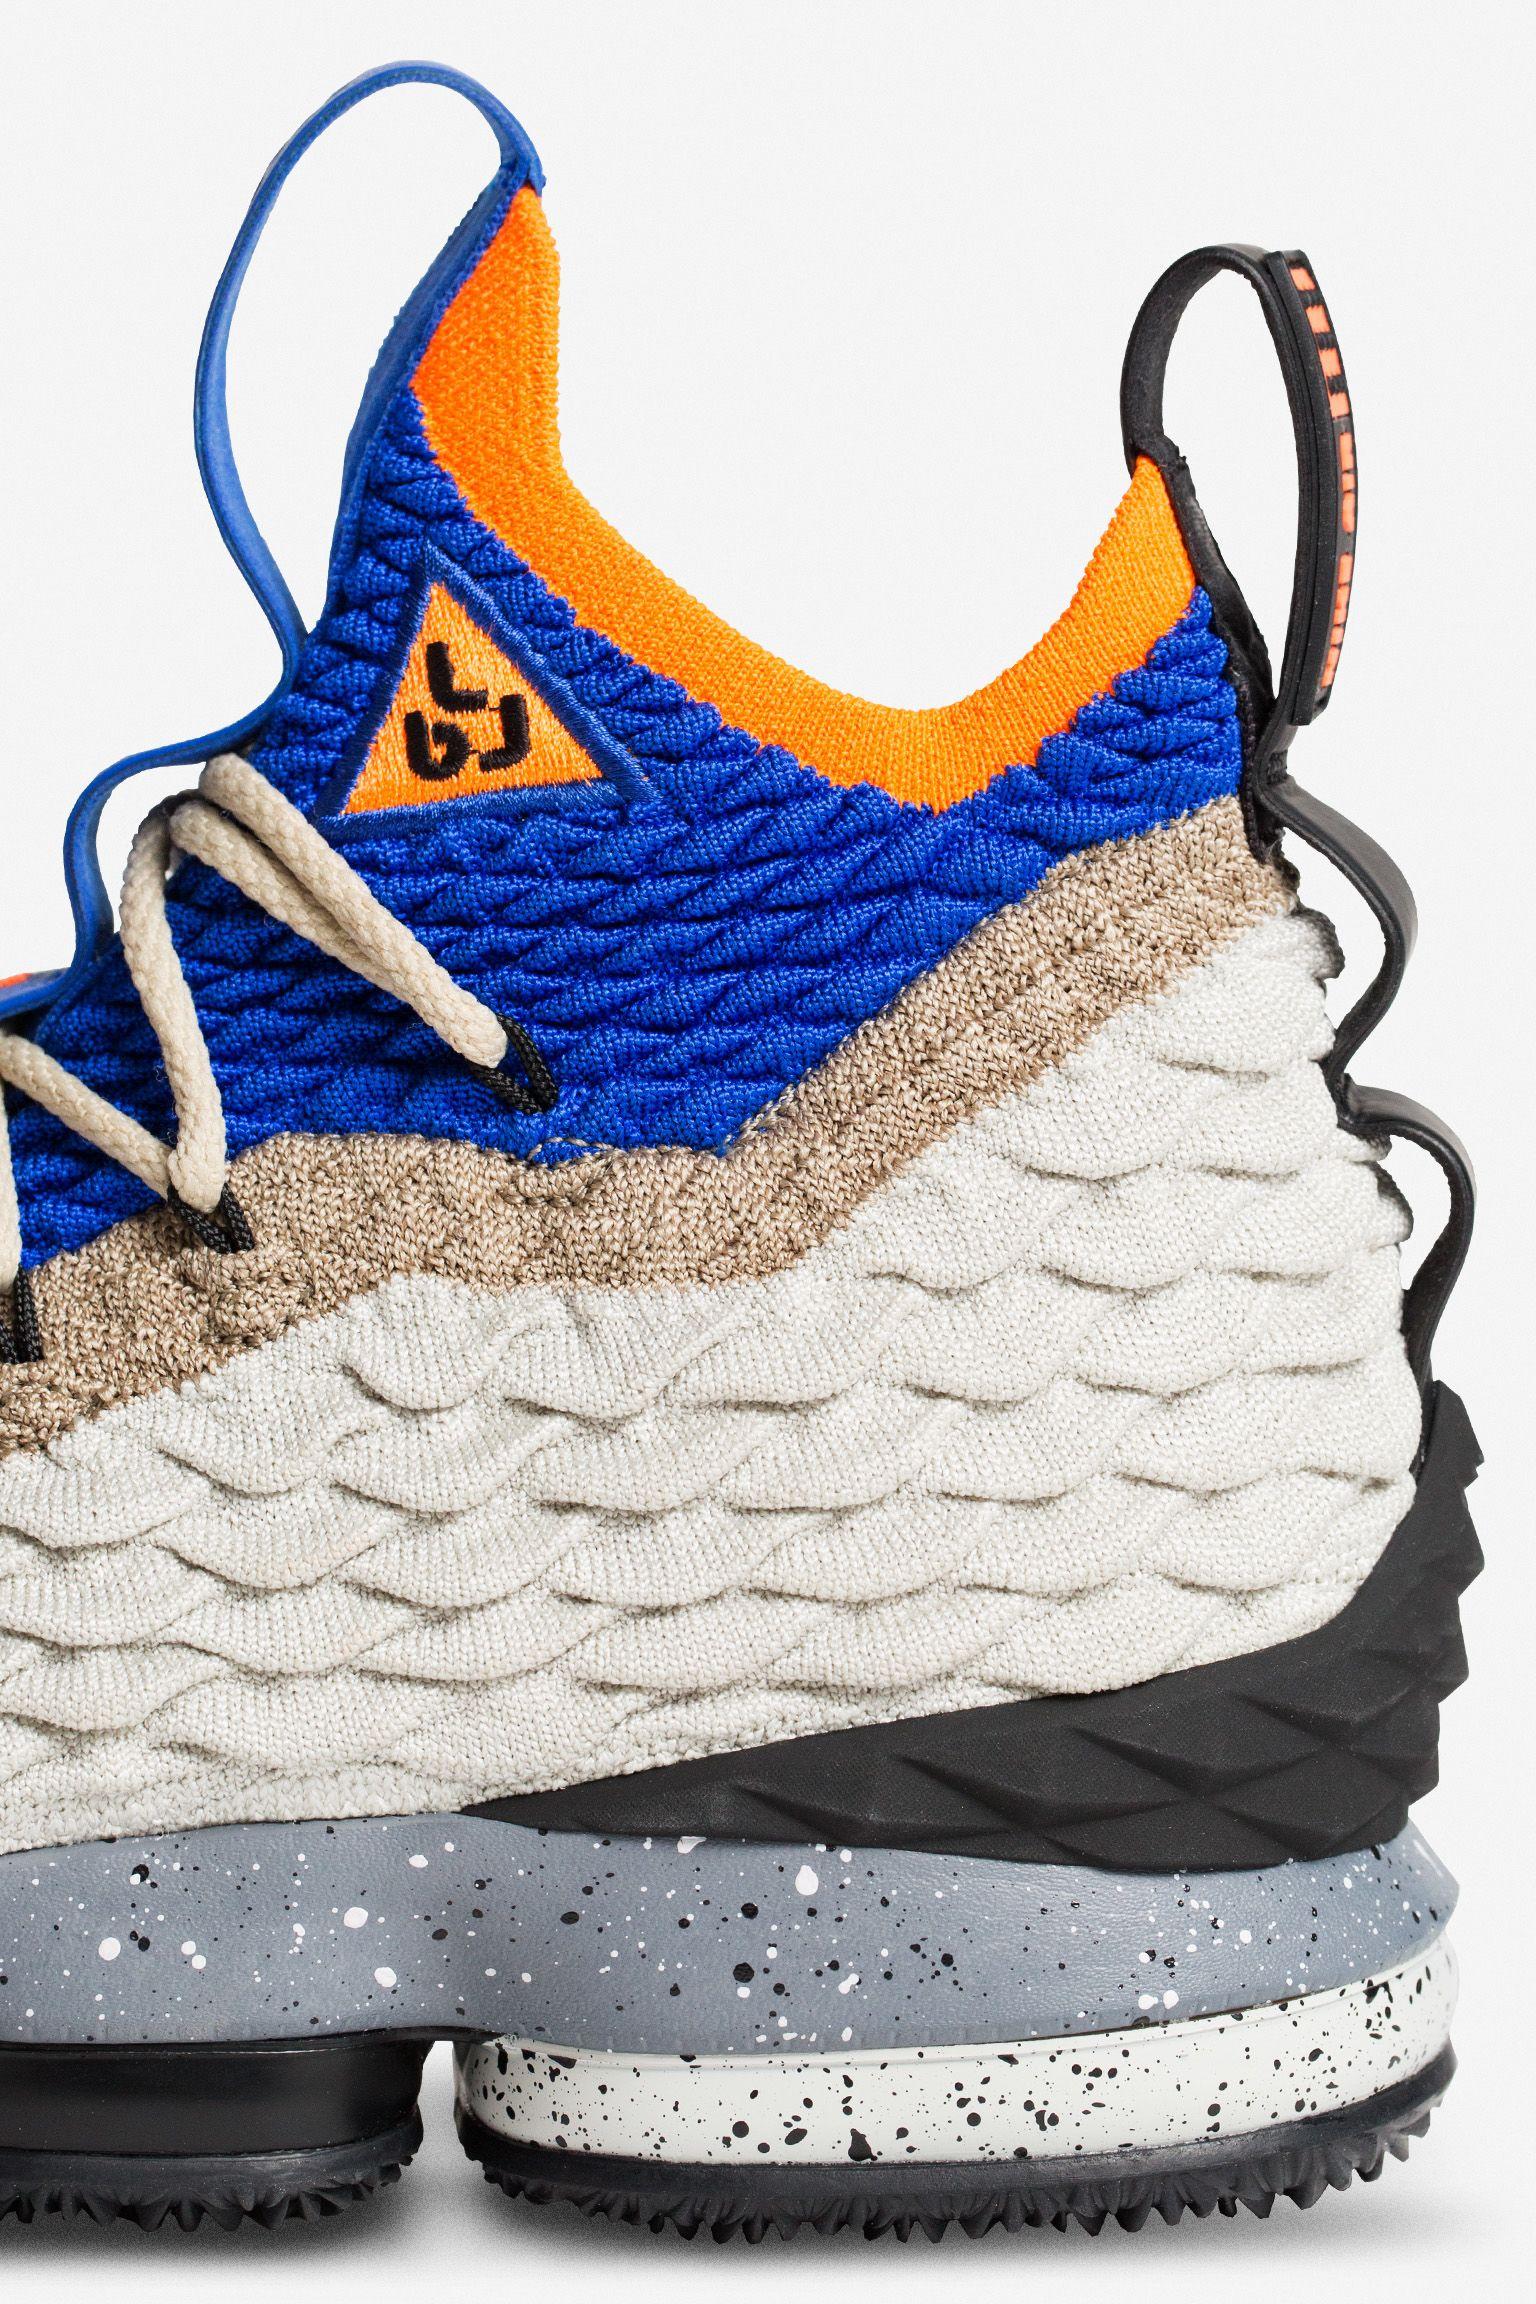 Nike Lebron 15 'Mowabb' Release Date